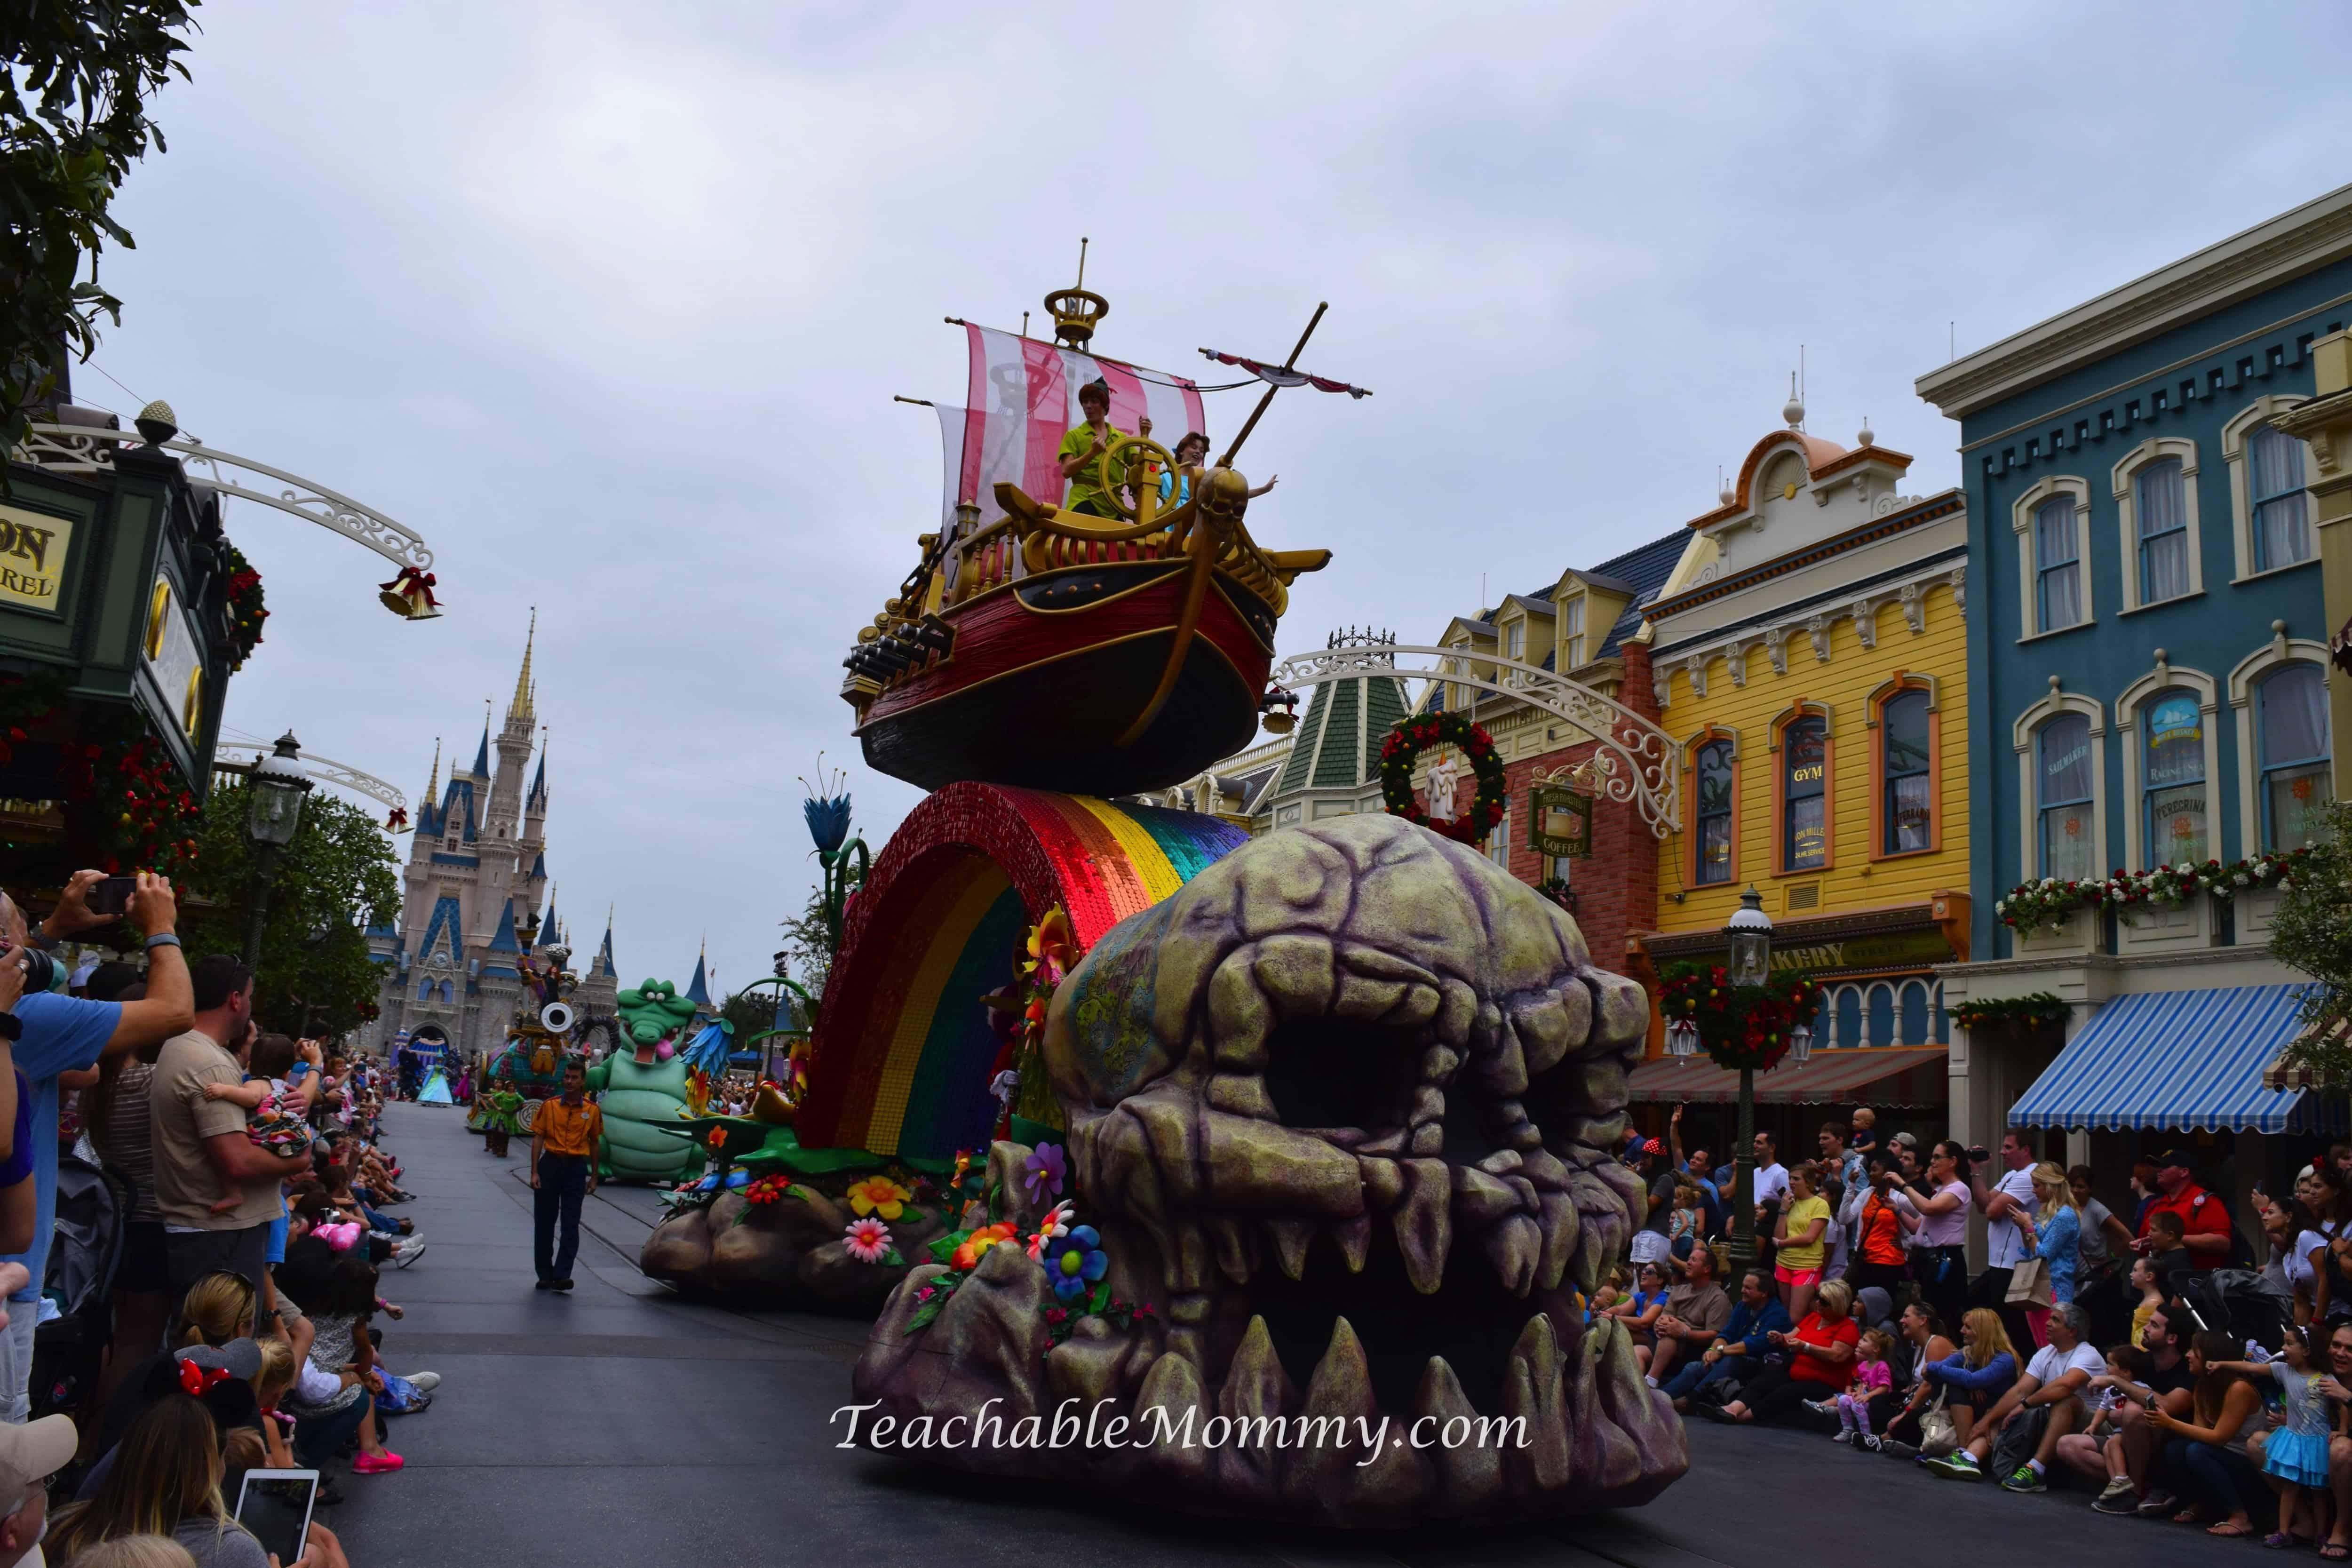 Magic Kingdom Festival Of Fantasy Parade! - Teachable Mommy